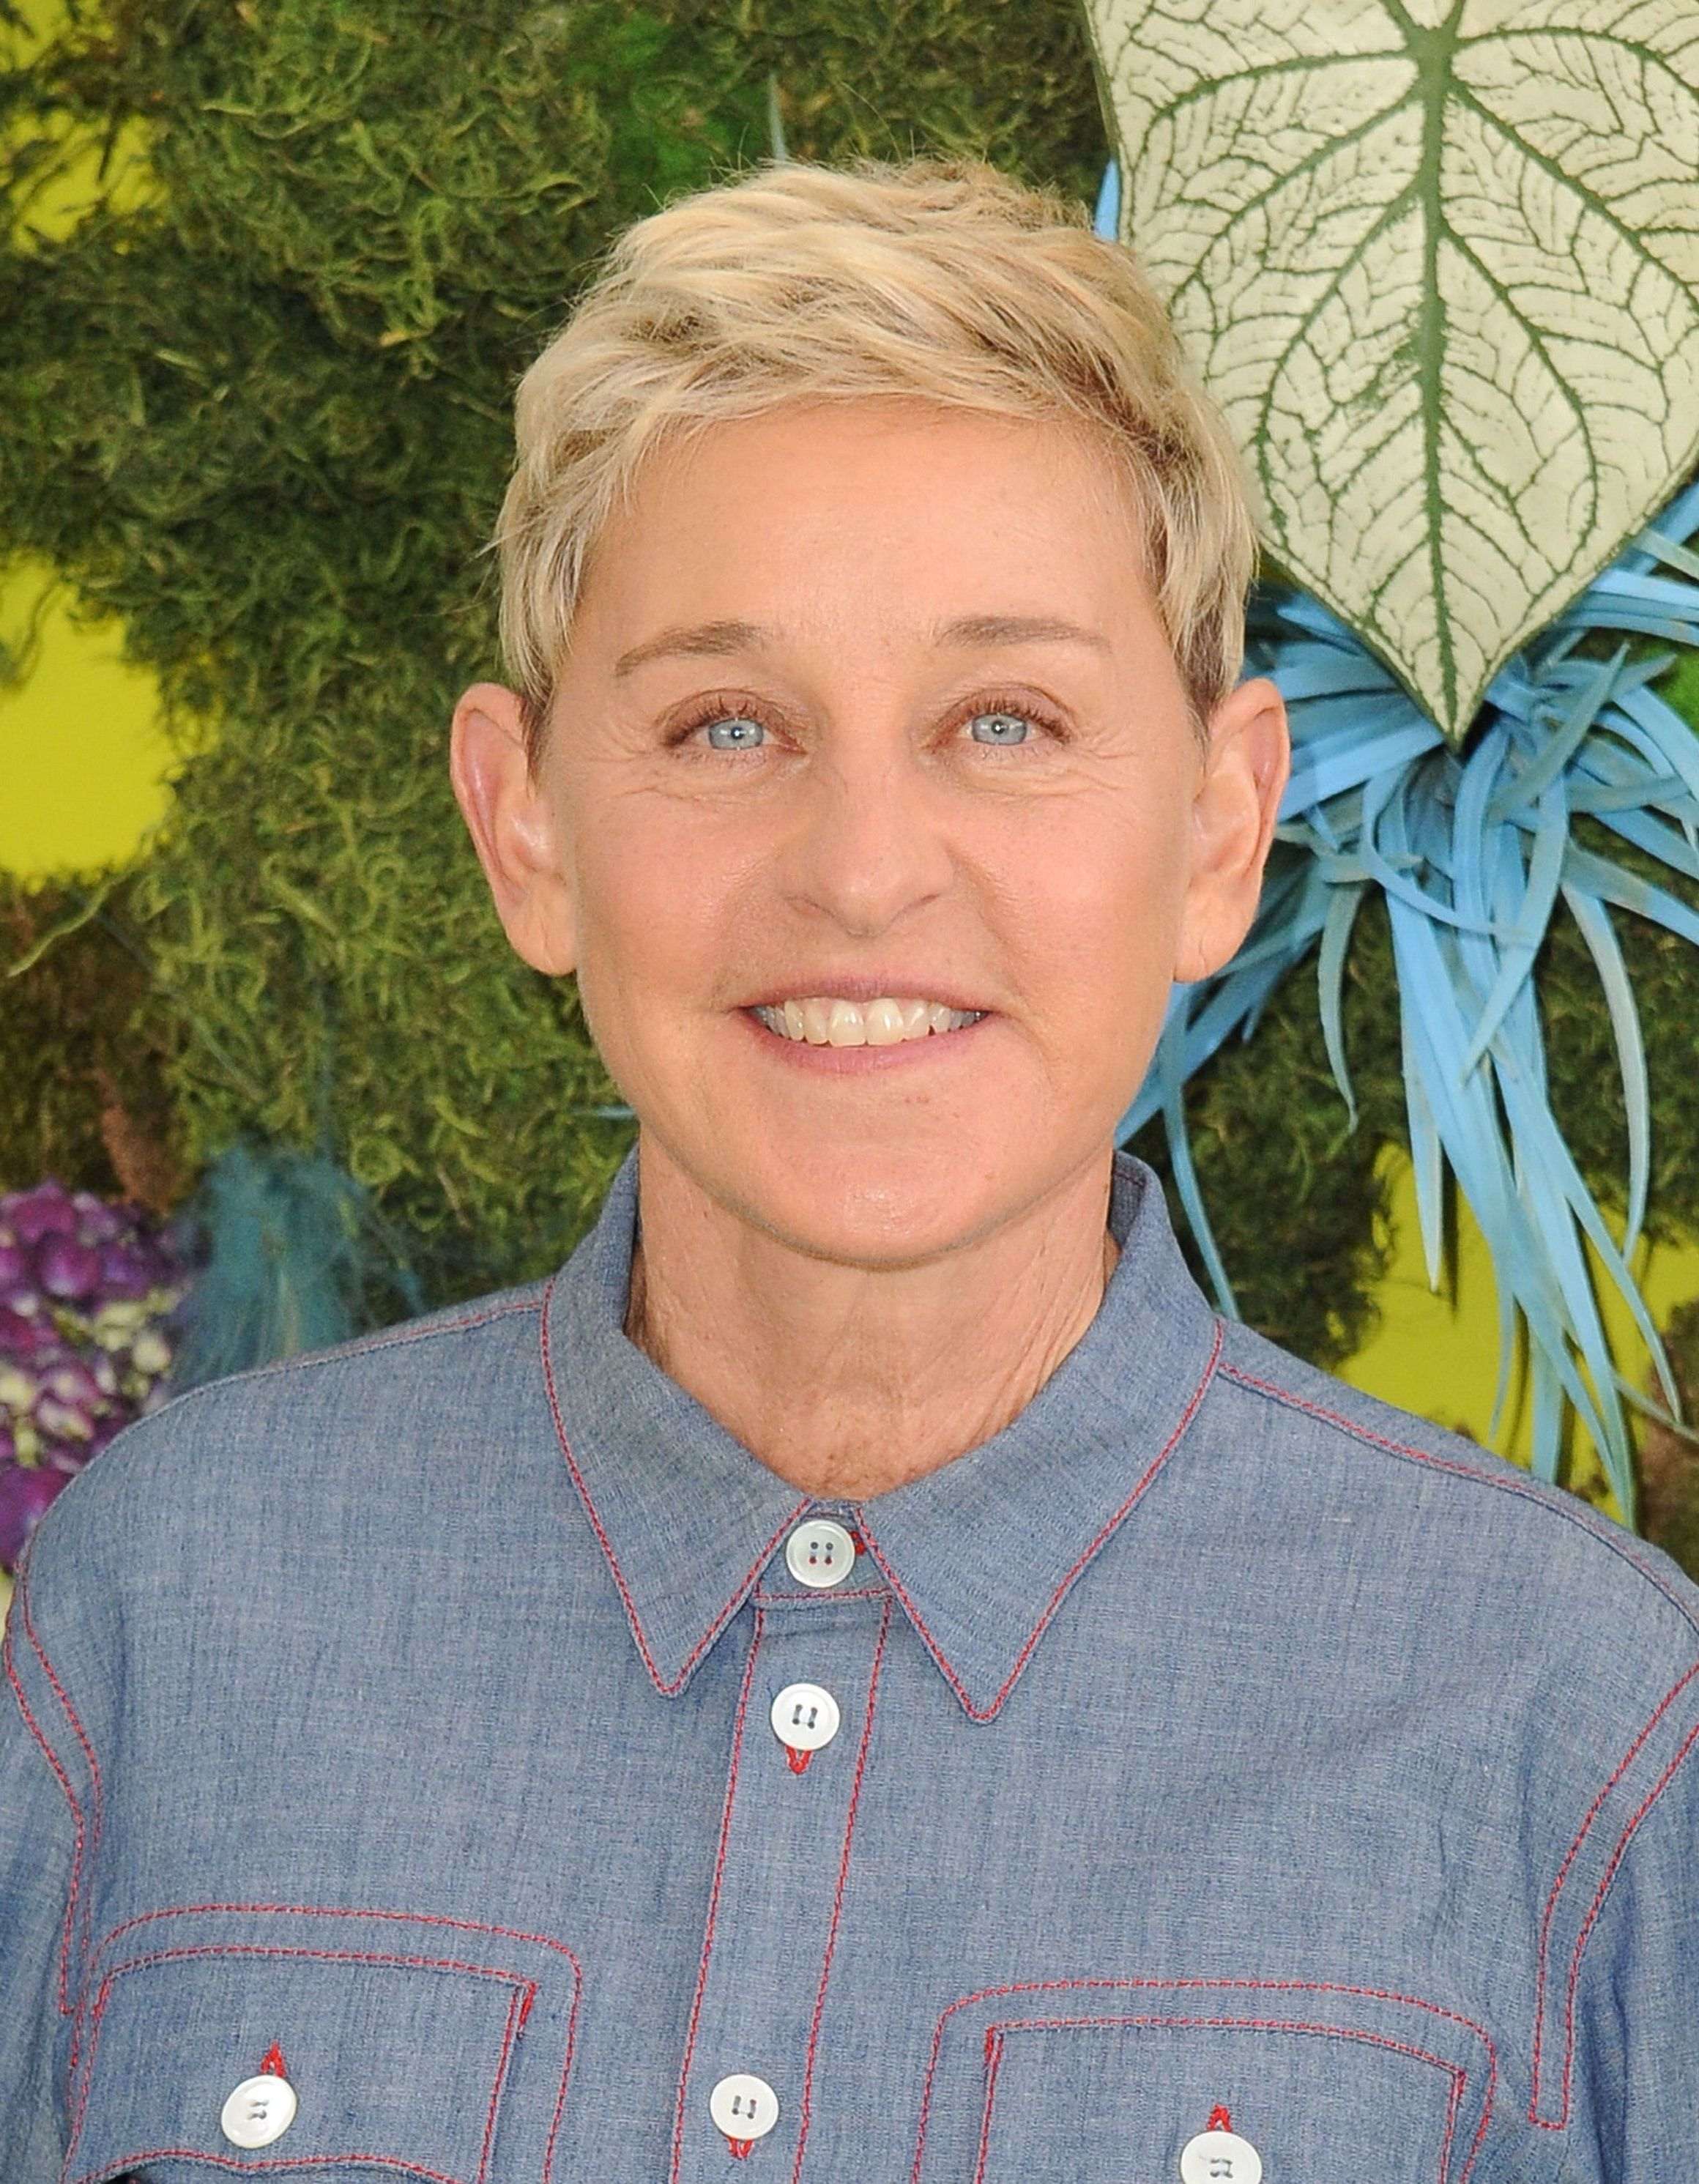 Ellen DeGeneres Strangely Promotes Think Tank, Fans